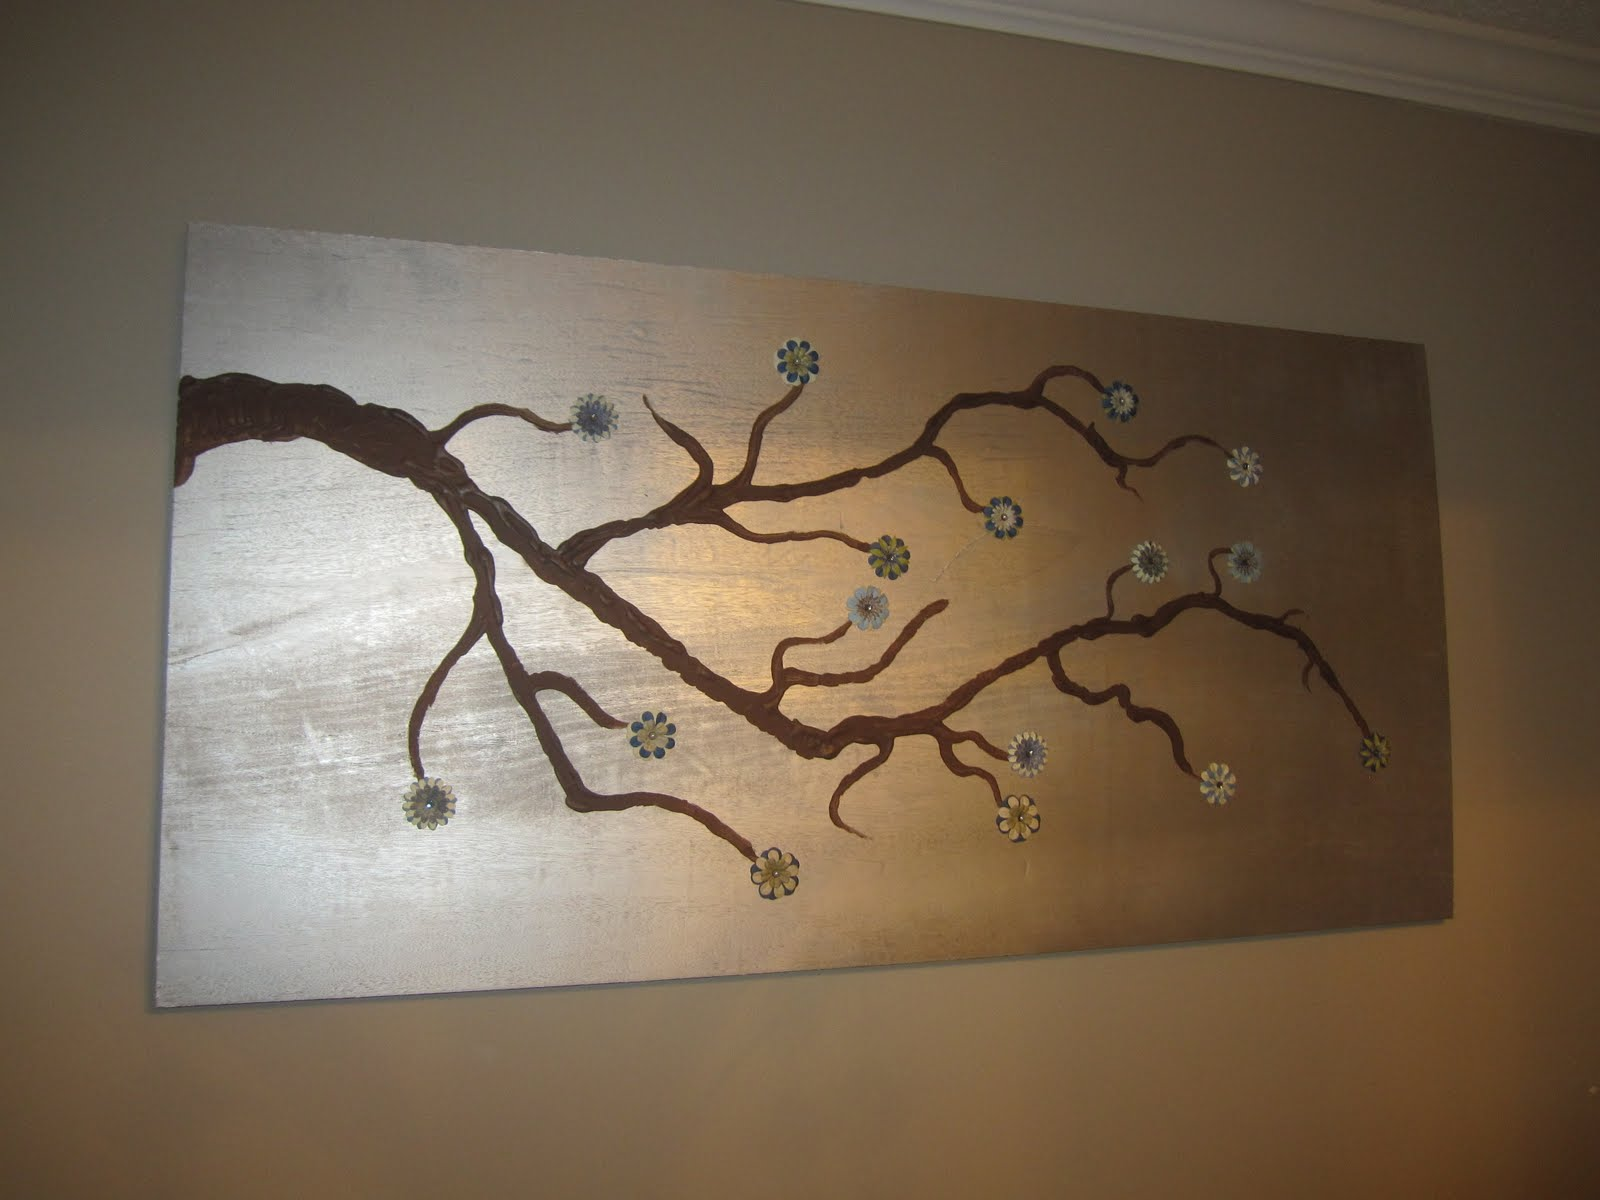 Raising them UP right!: New tree branch wall art